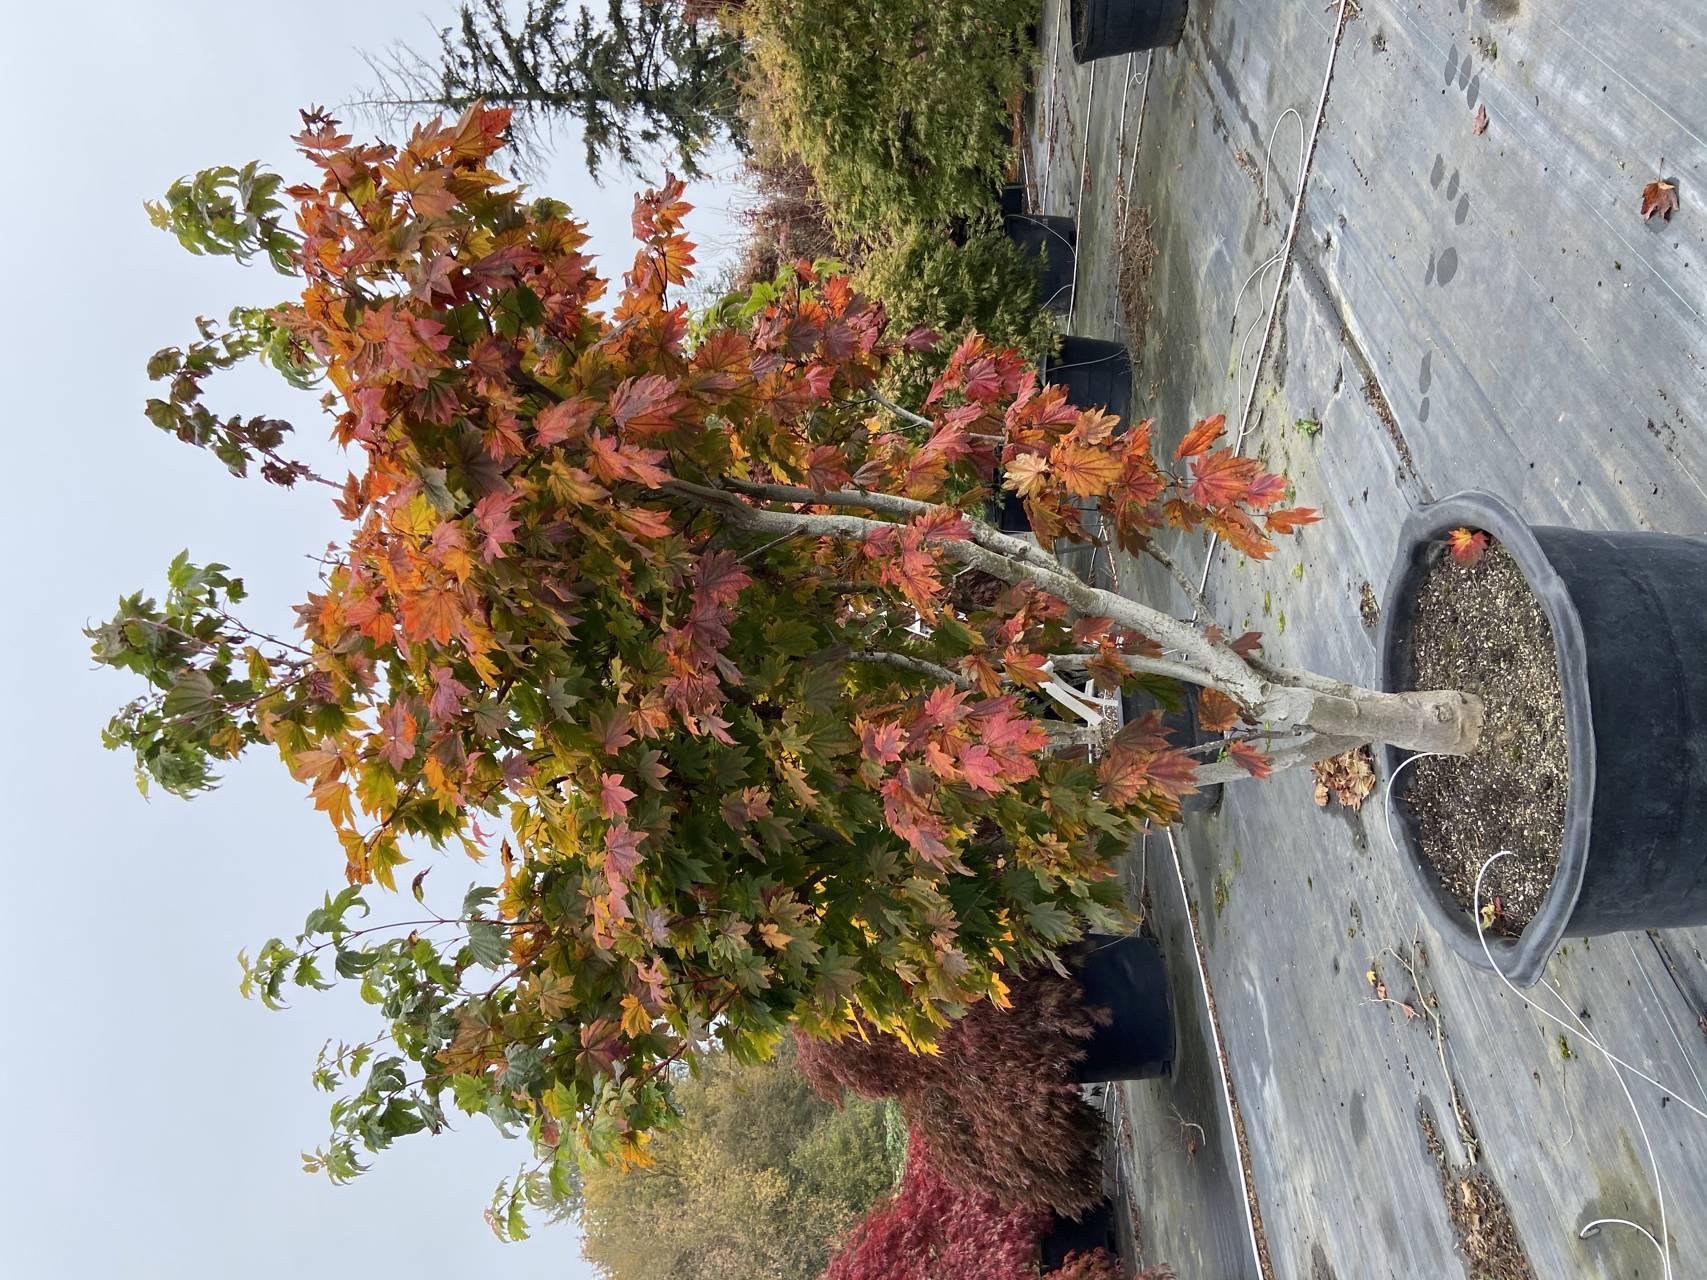 Acer japonicum Taki no gawa Japanese maple Full Moon leaves color green red orange purple